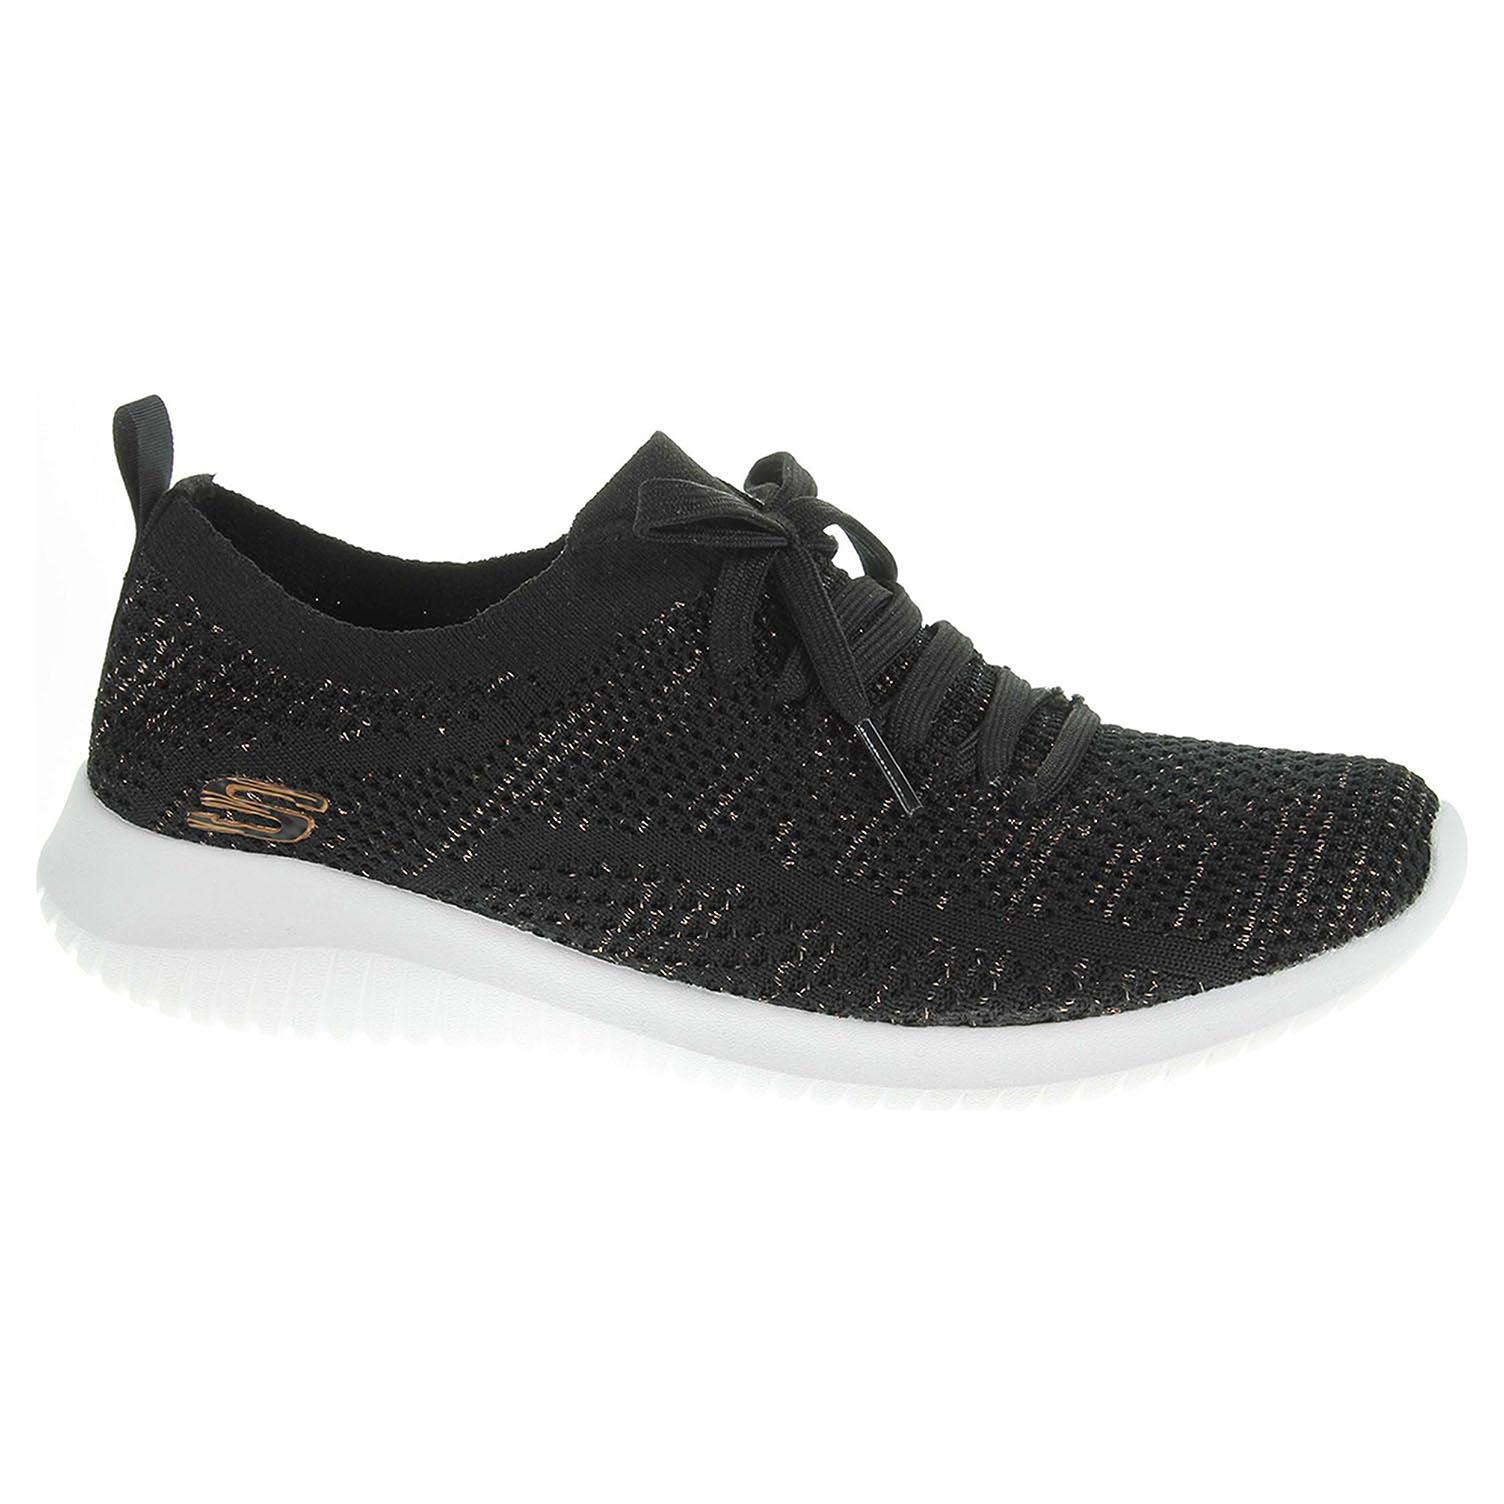 Skechers Ultra Flex - Salutations black-gold 12843 BKGD 40